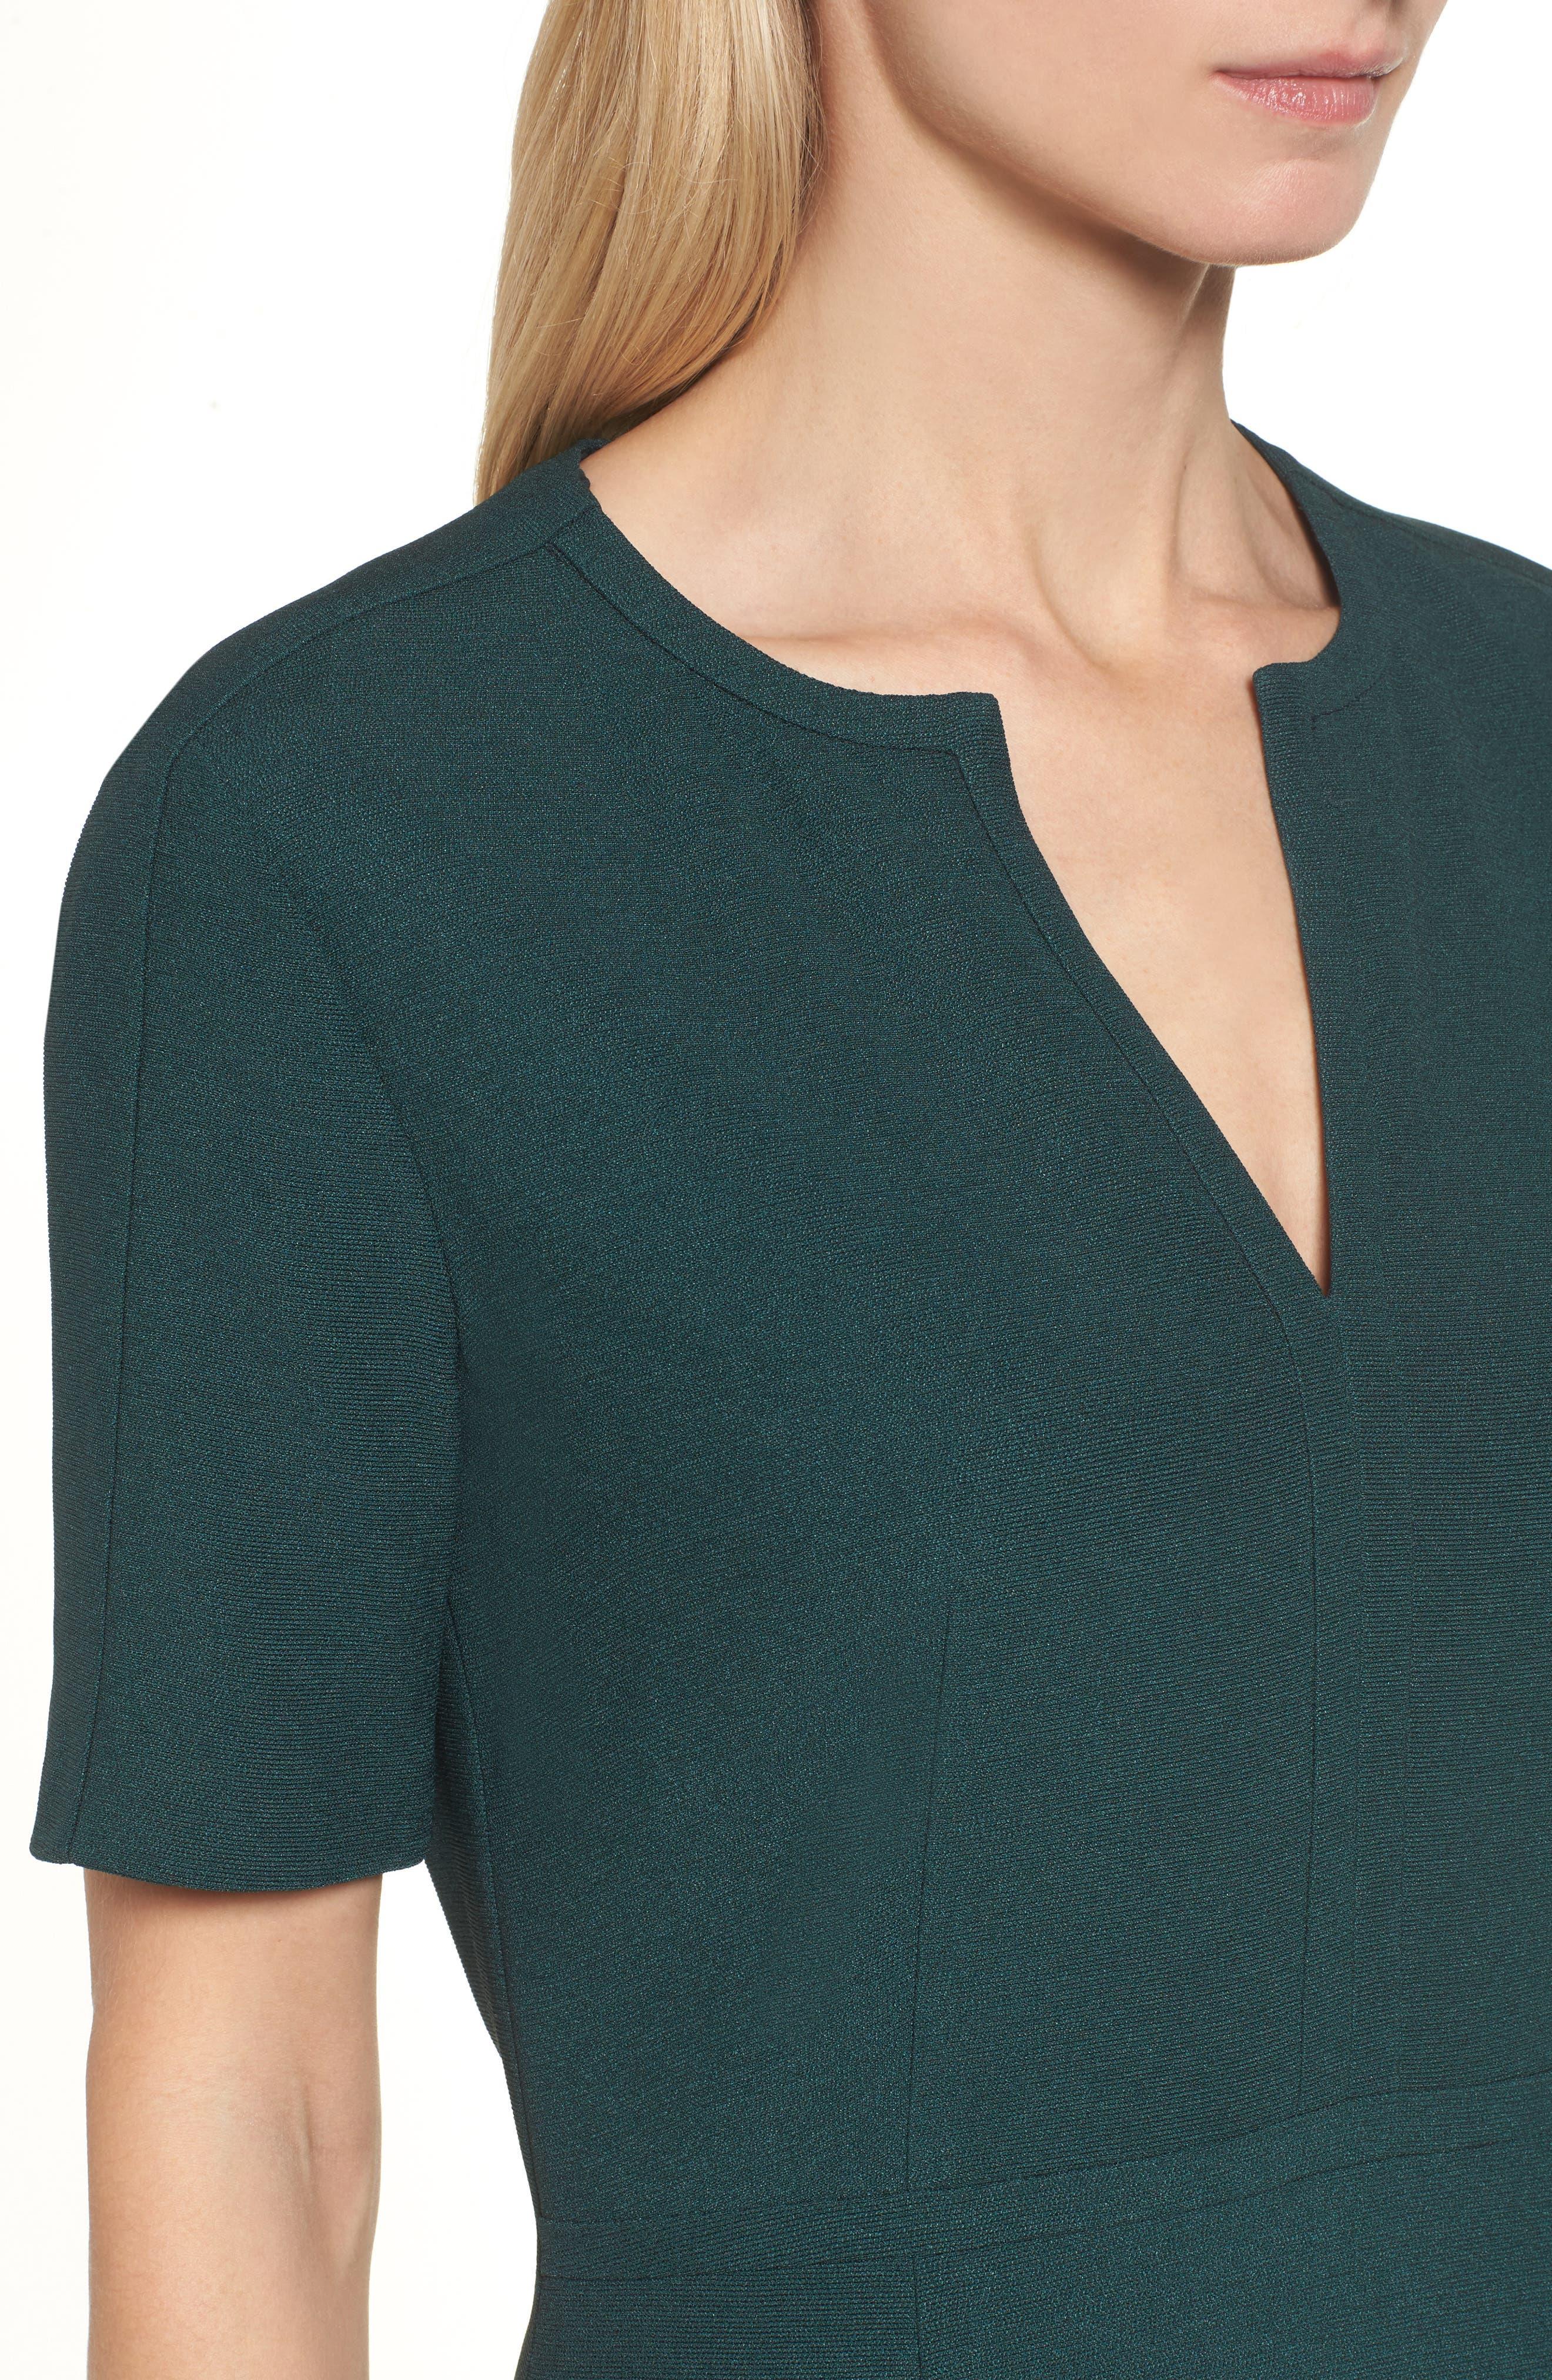 Dalesana Sheath Dress,                             Alternate thumbnail 4, color,                             301